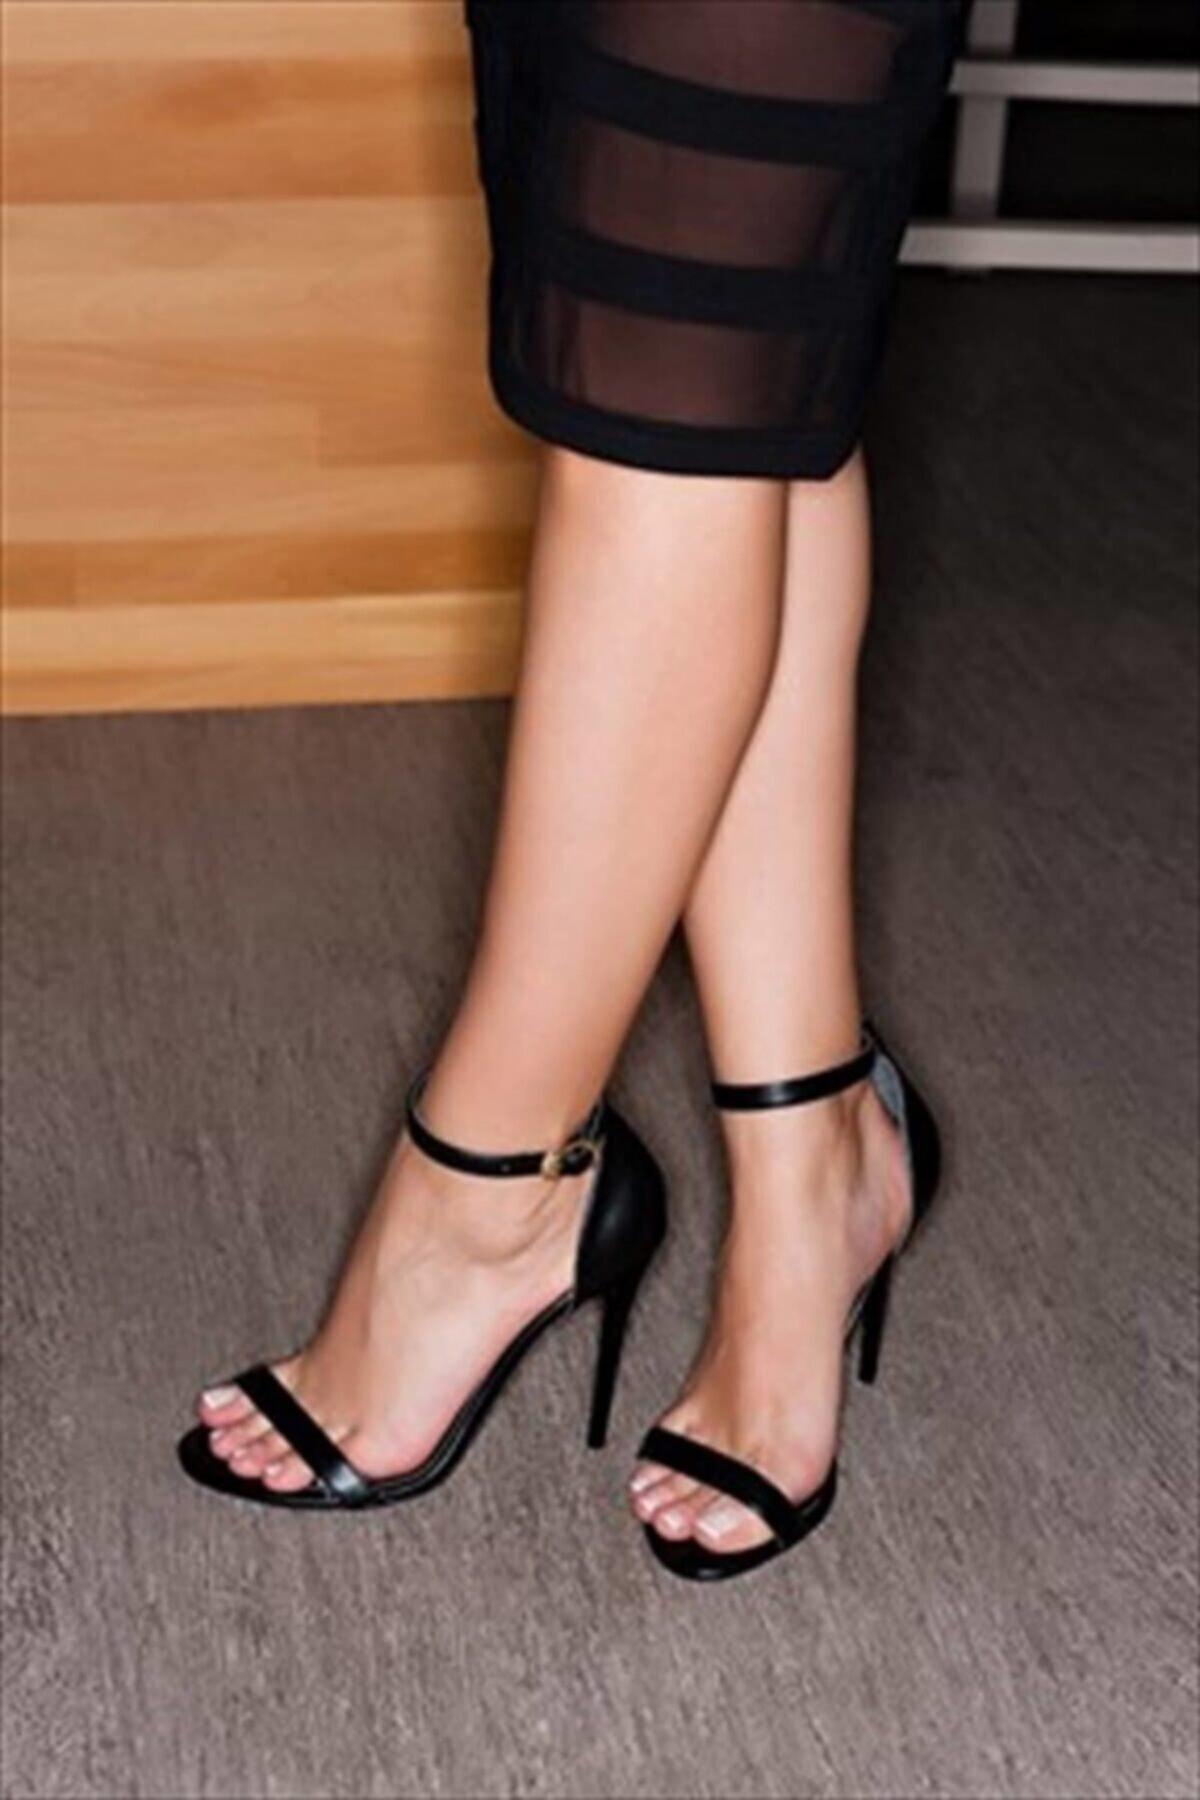 Fox Shoes Siyah Kadın Topuklu Ayakkabı B922112609 1